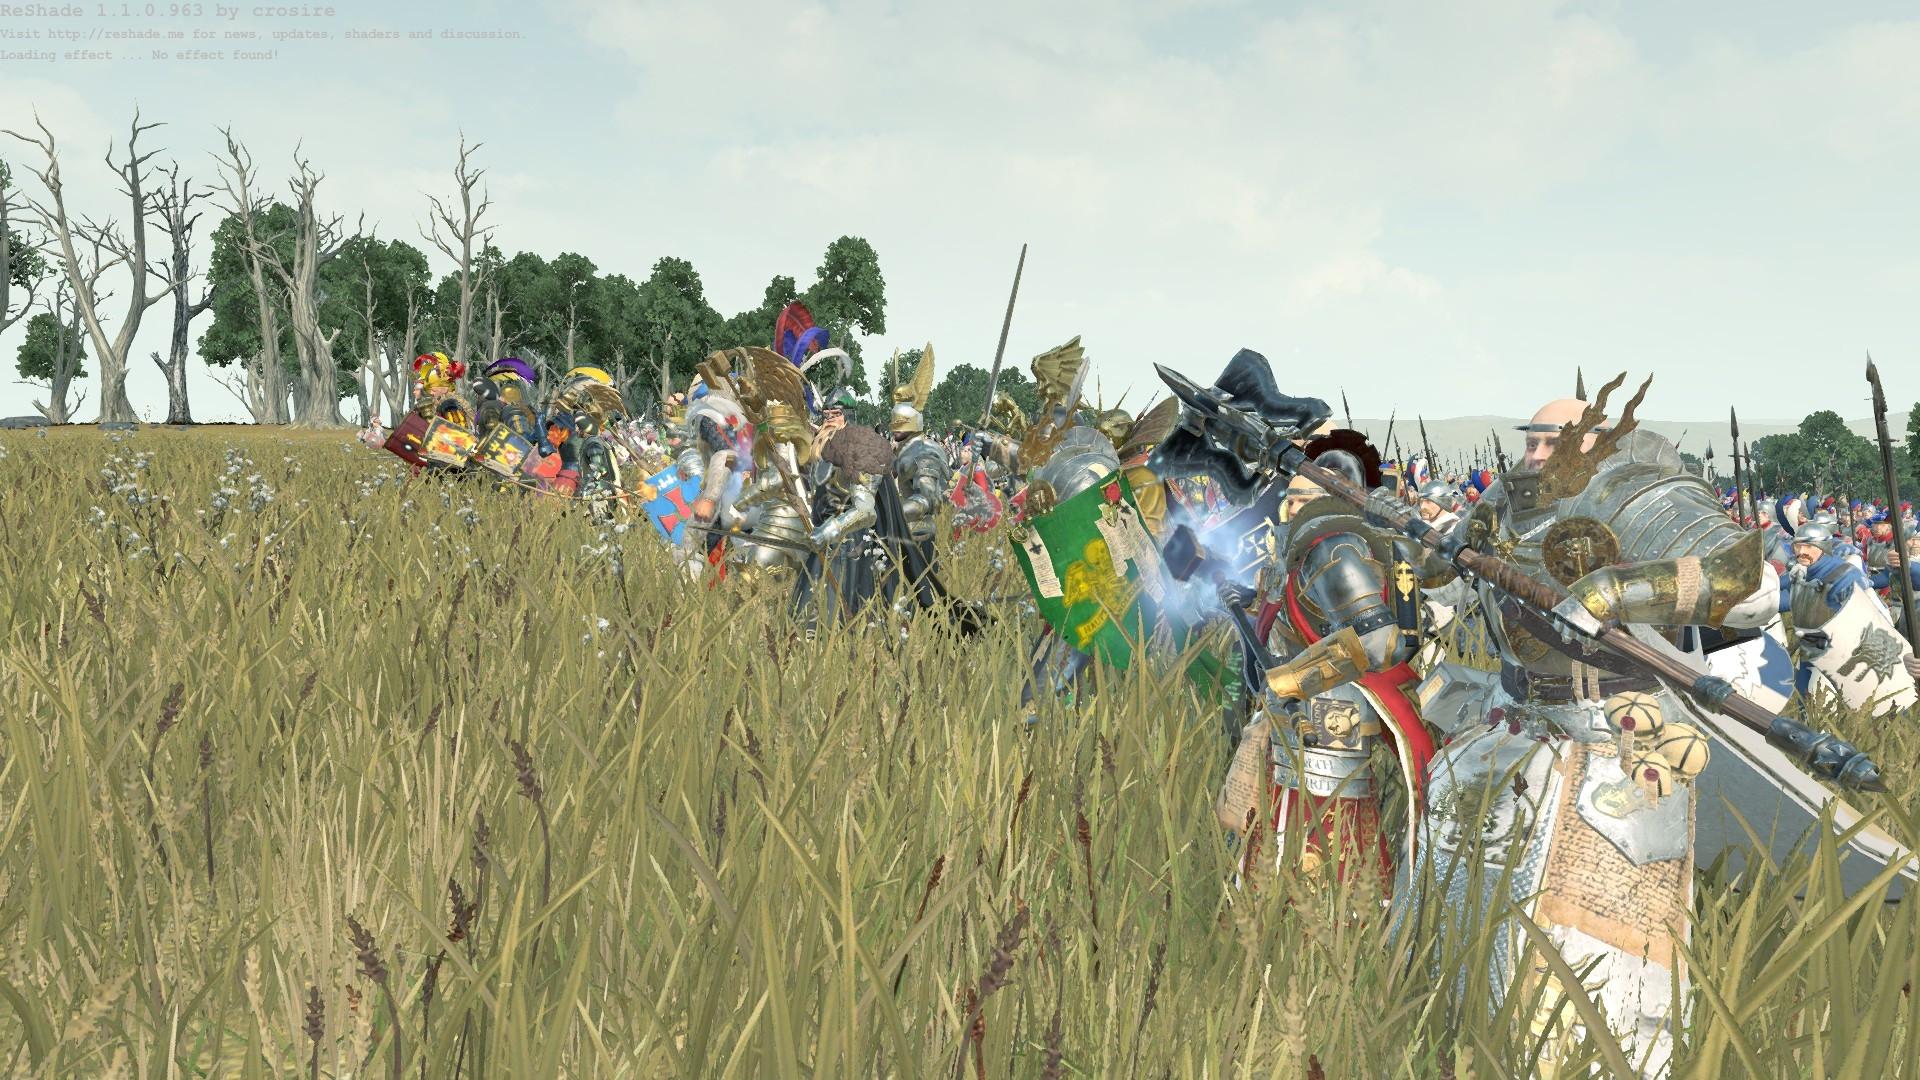 Karl Franz: summon my electors! — Total War Forums